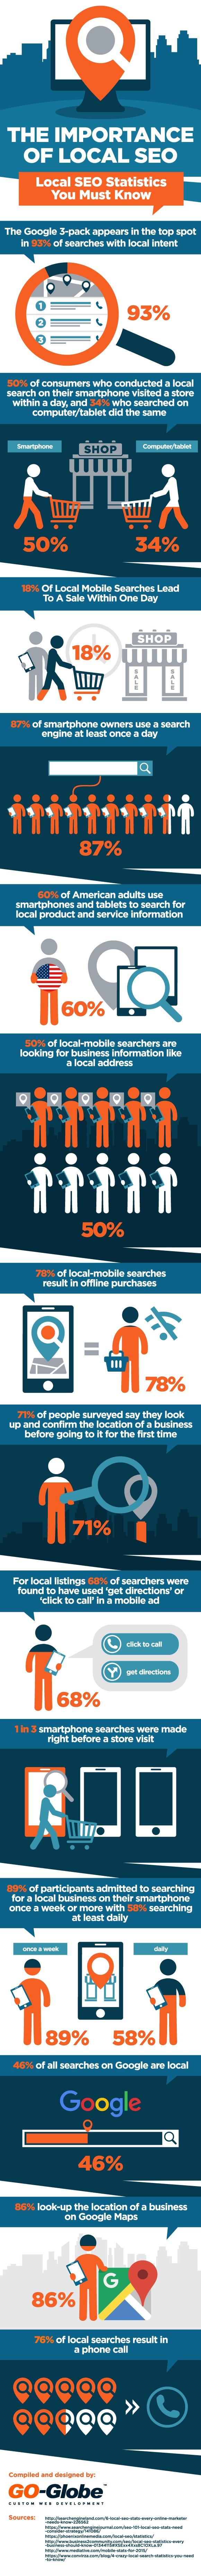 local-seo-stats-infographic.jpg